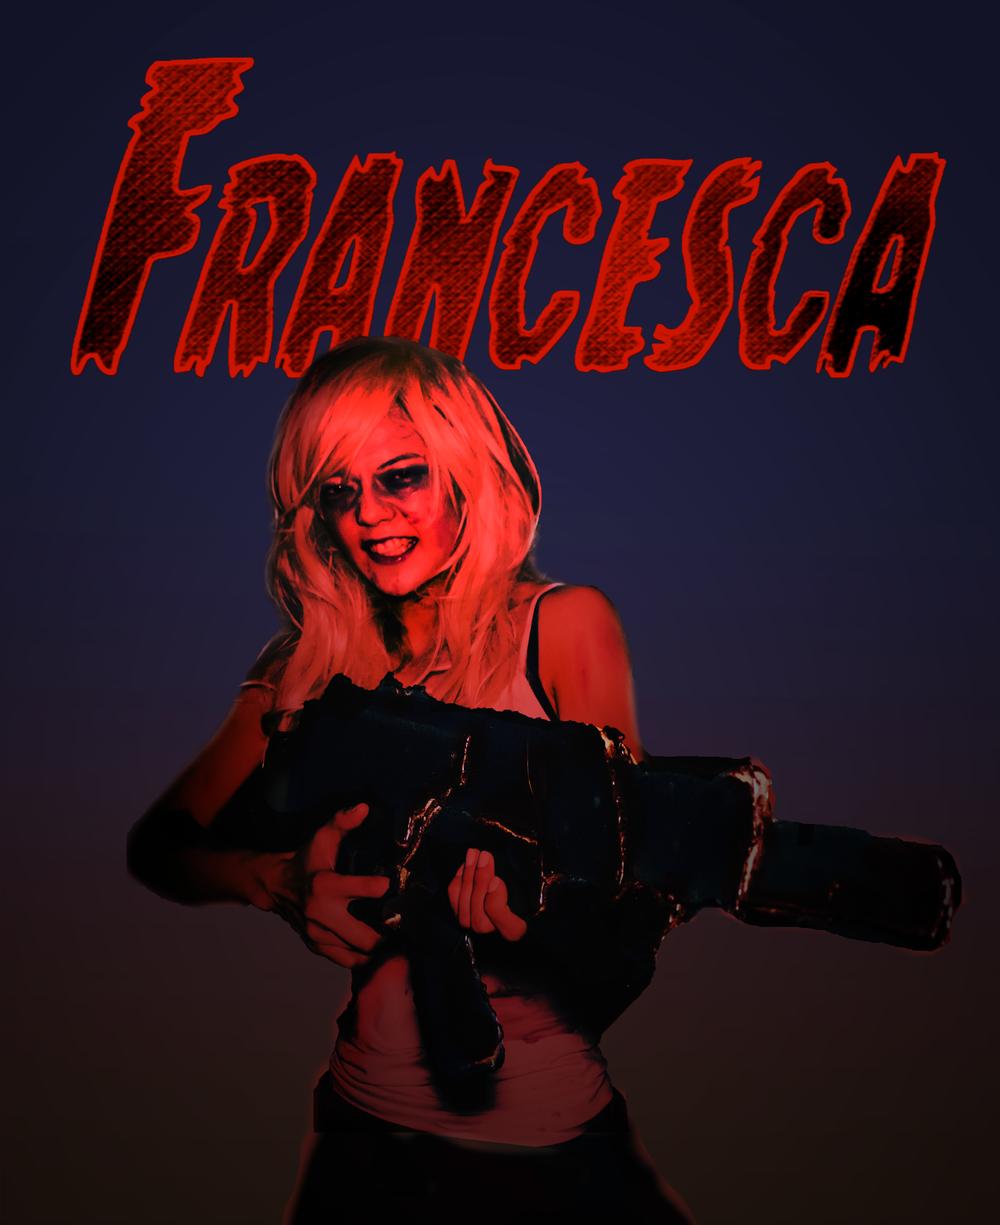 Francesca-moster_final.jpg